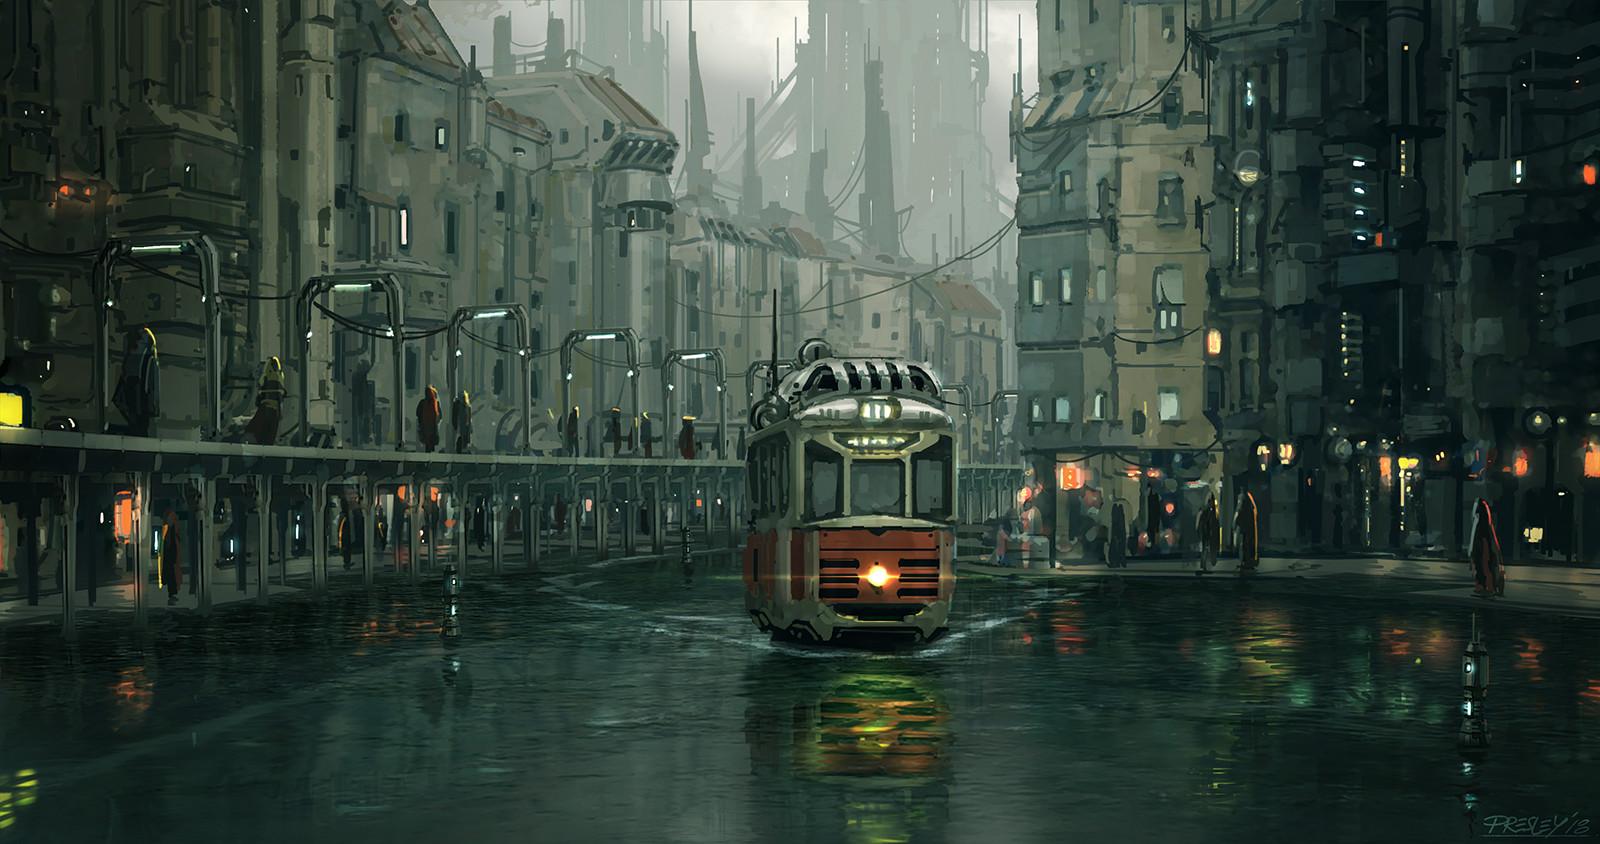 Pat presley berlin floodcity sketch repaint wip01a the f line